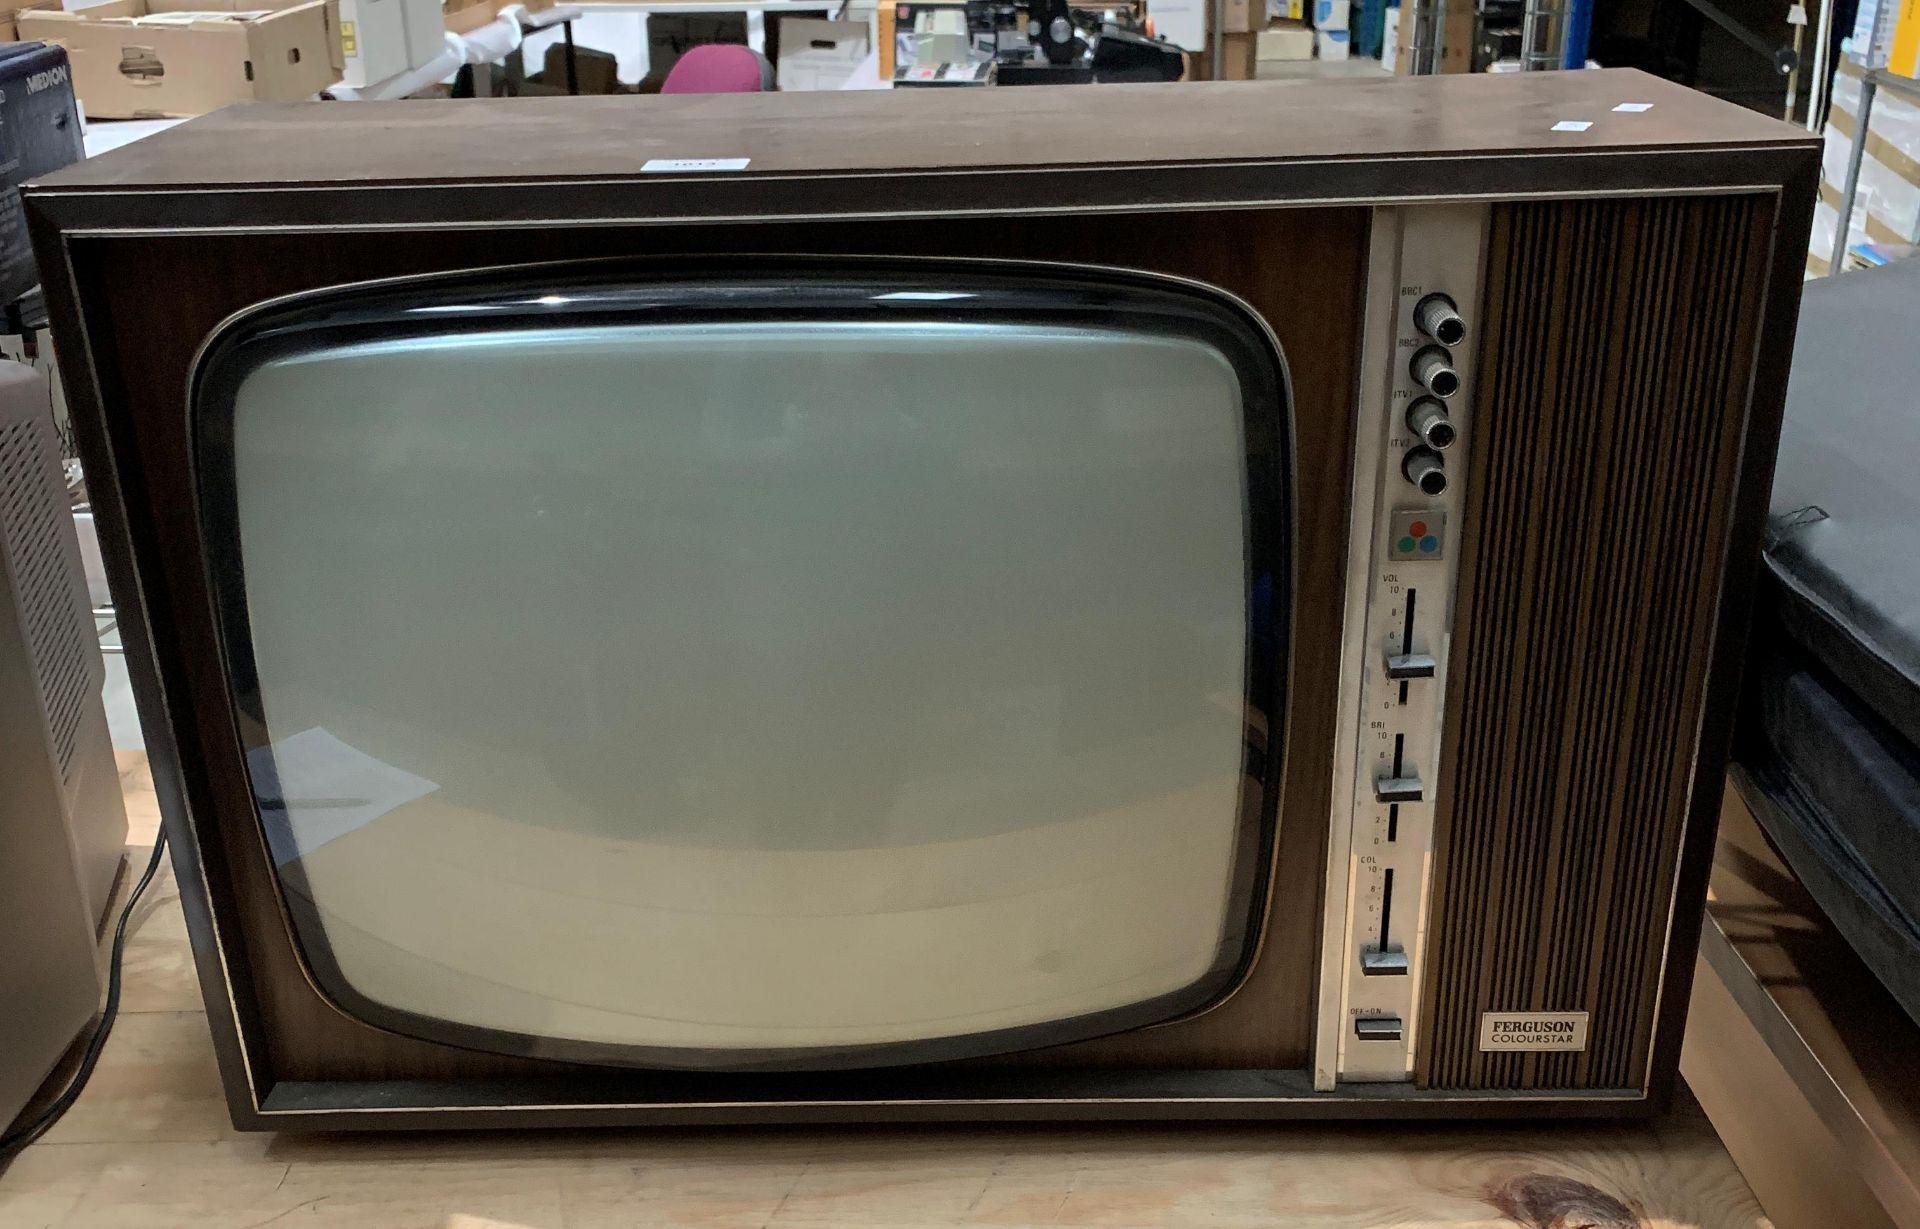 "A Ferguson Colour Star model no: 3713 20"" vintage TV - Image 2 of 2"